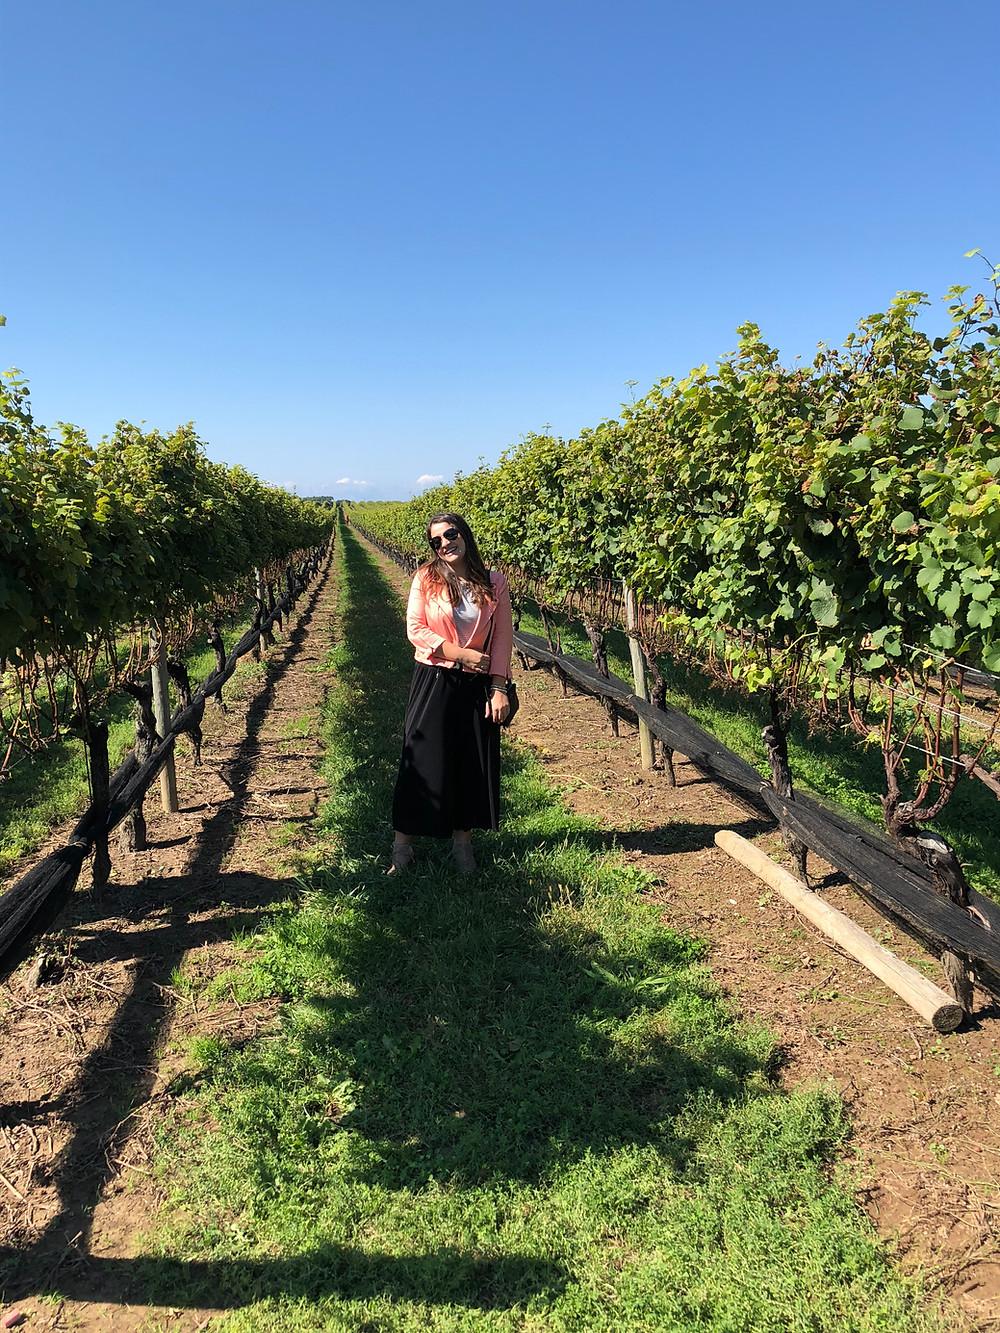 Pindar winery, nyc wine tour, by alana robin